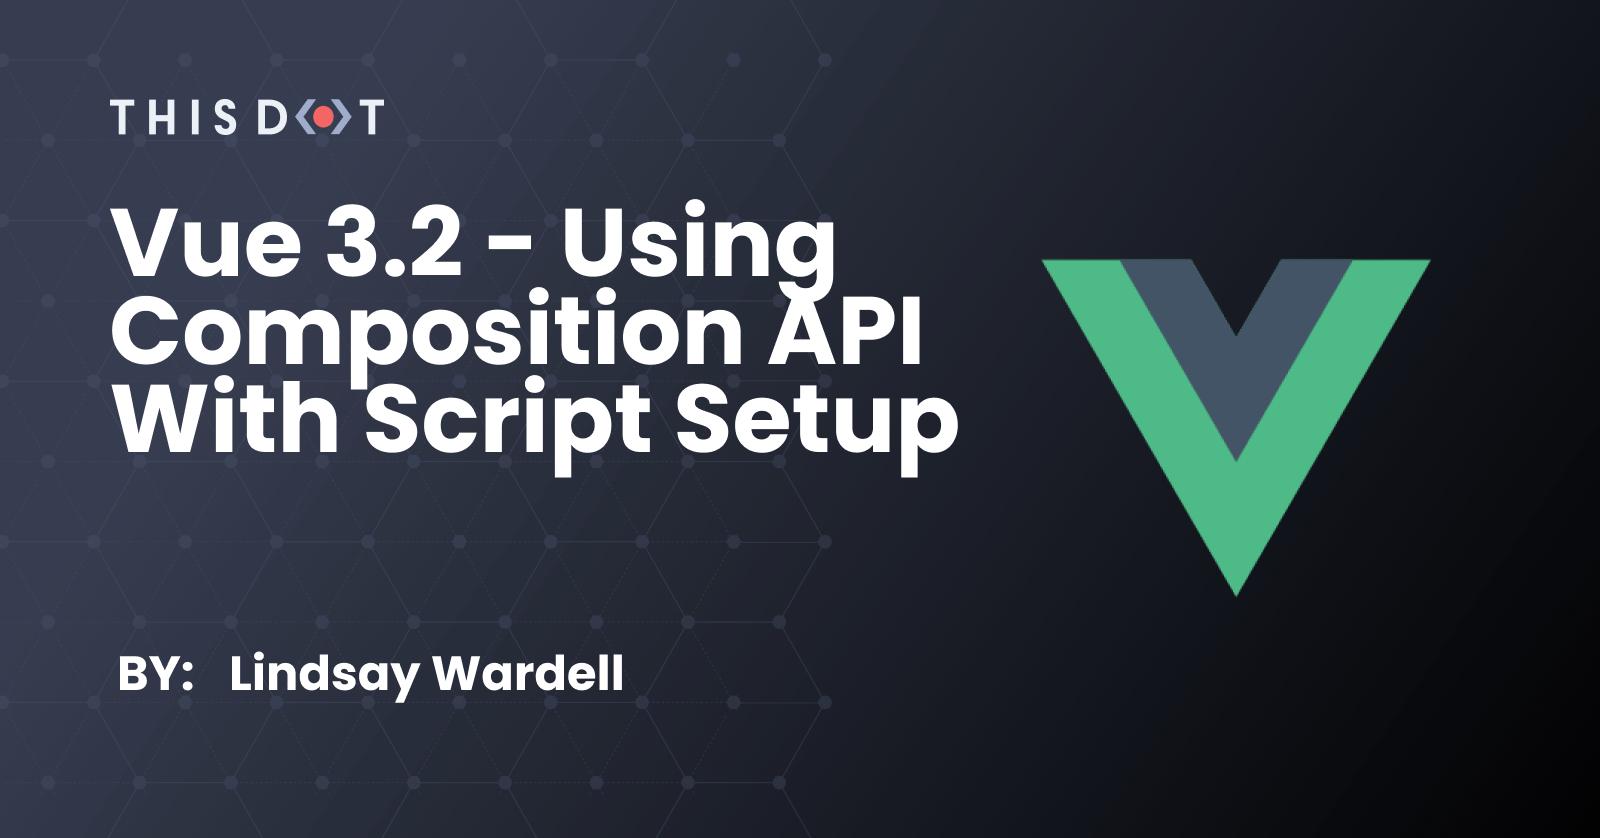 Vue 3.2 - Using Composition API with Script Setup